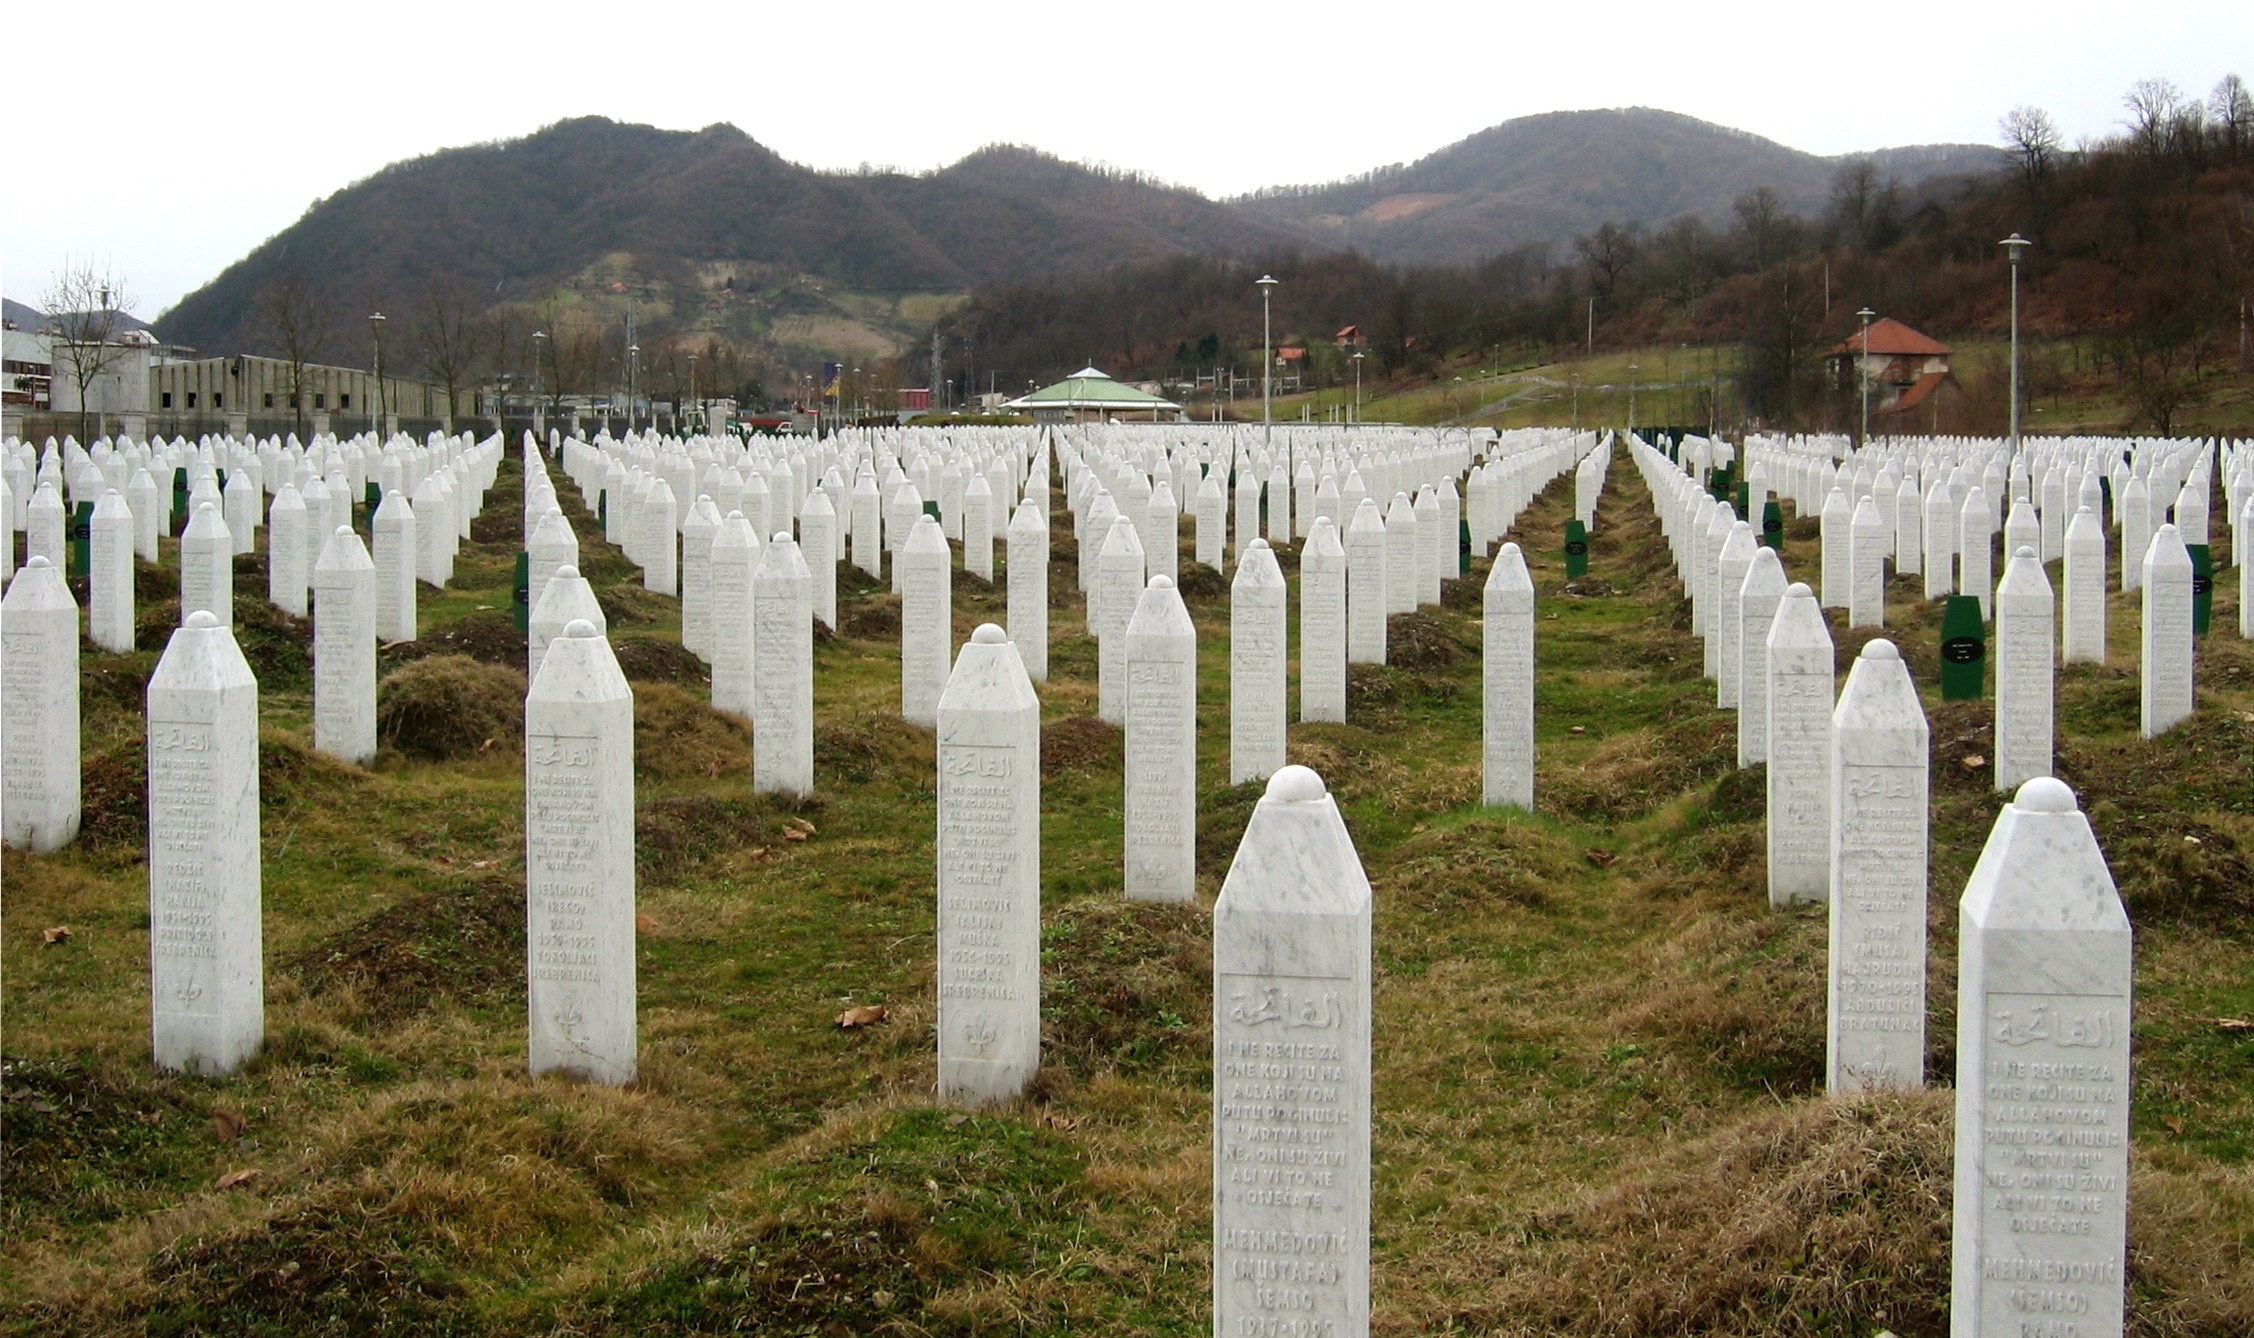 Srebrenica massacre memorial gravestones 2009